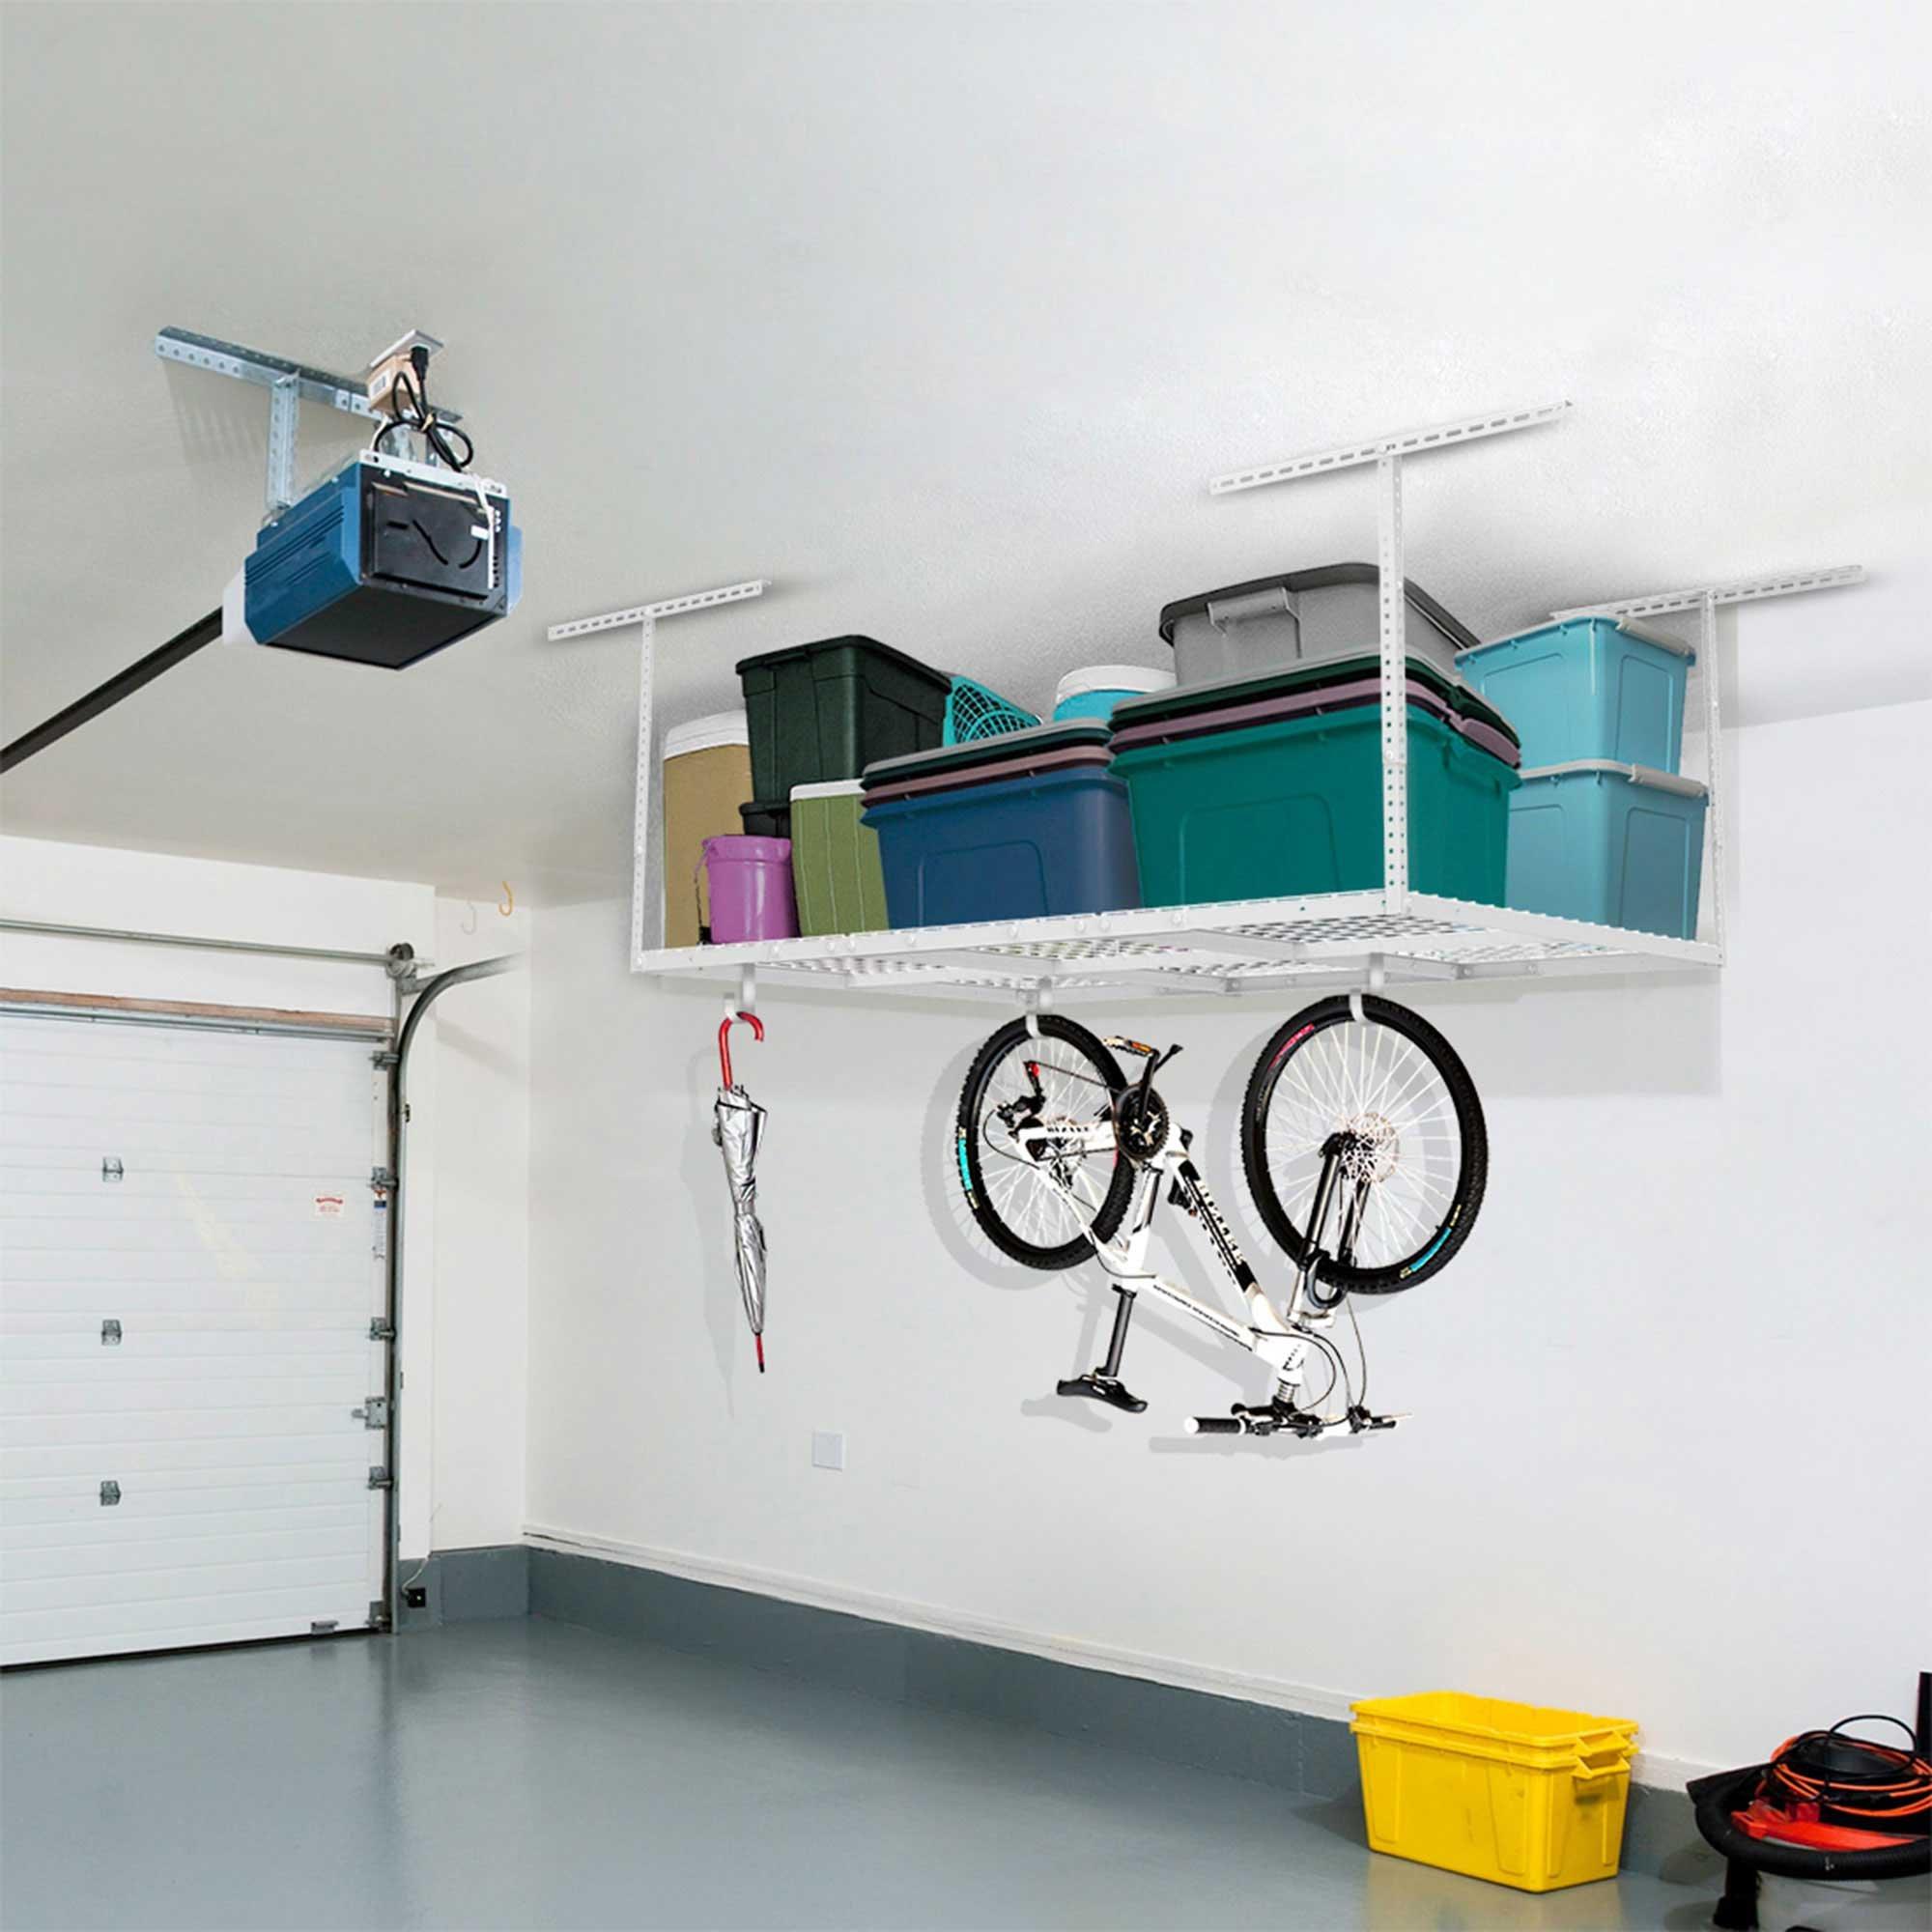 FLEXIMOUNTS 4x6 Heavy Duty Overhead Garage Adjustable Ceiling Storage Rack, 72'' Length x 48'' Width x 40'' Height, White